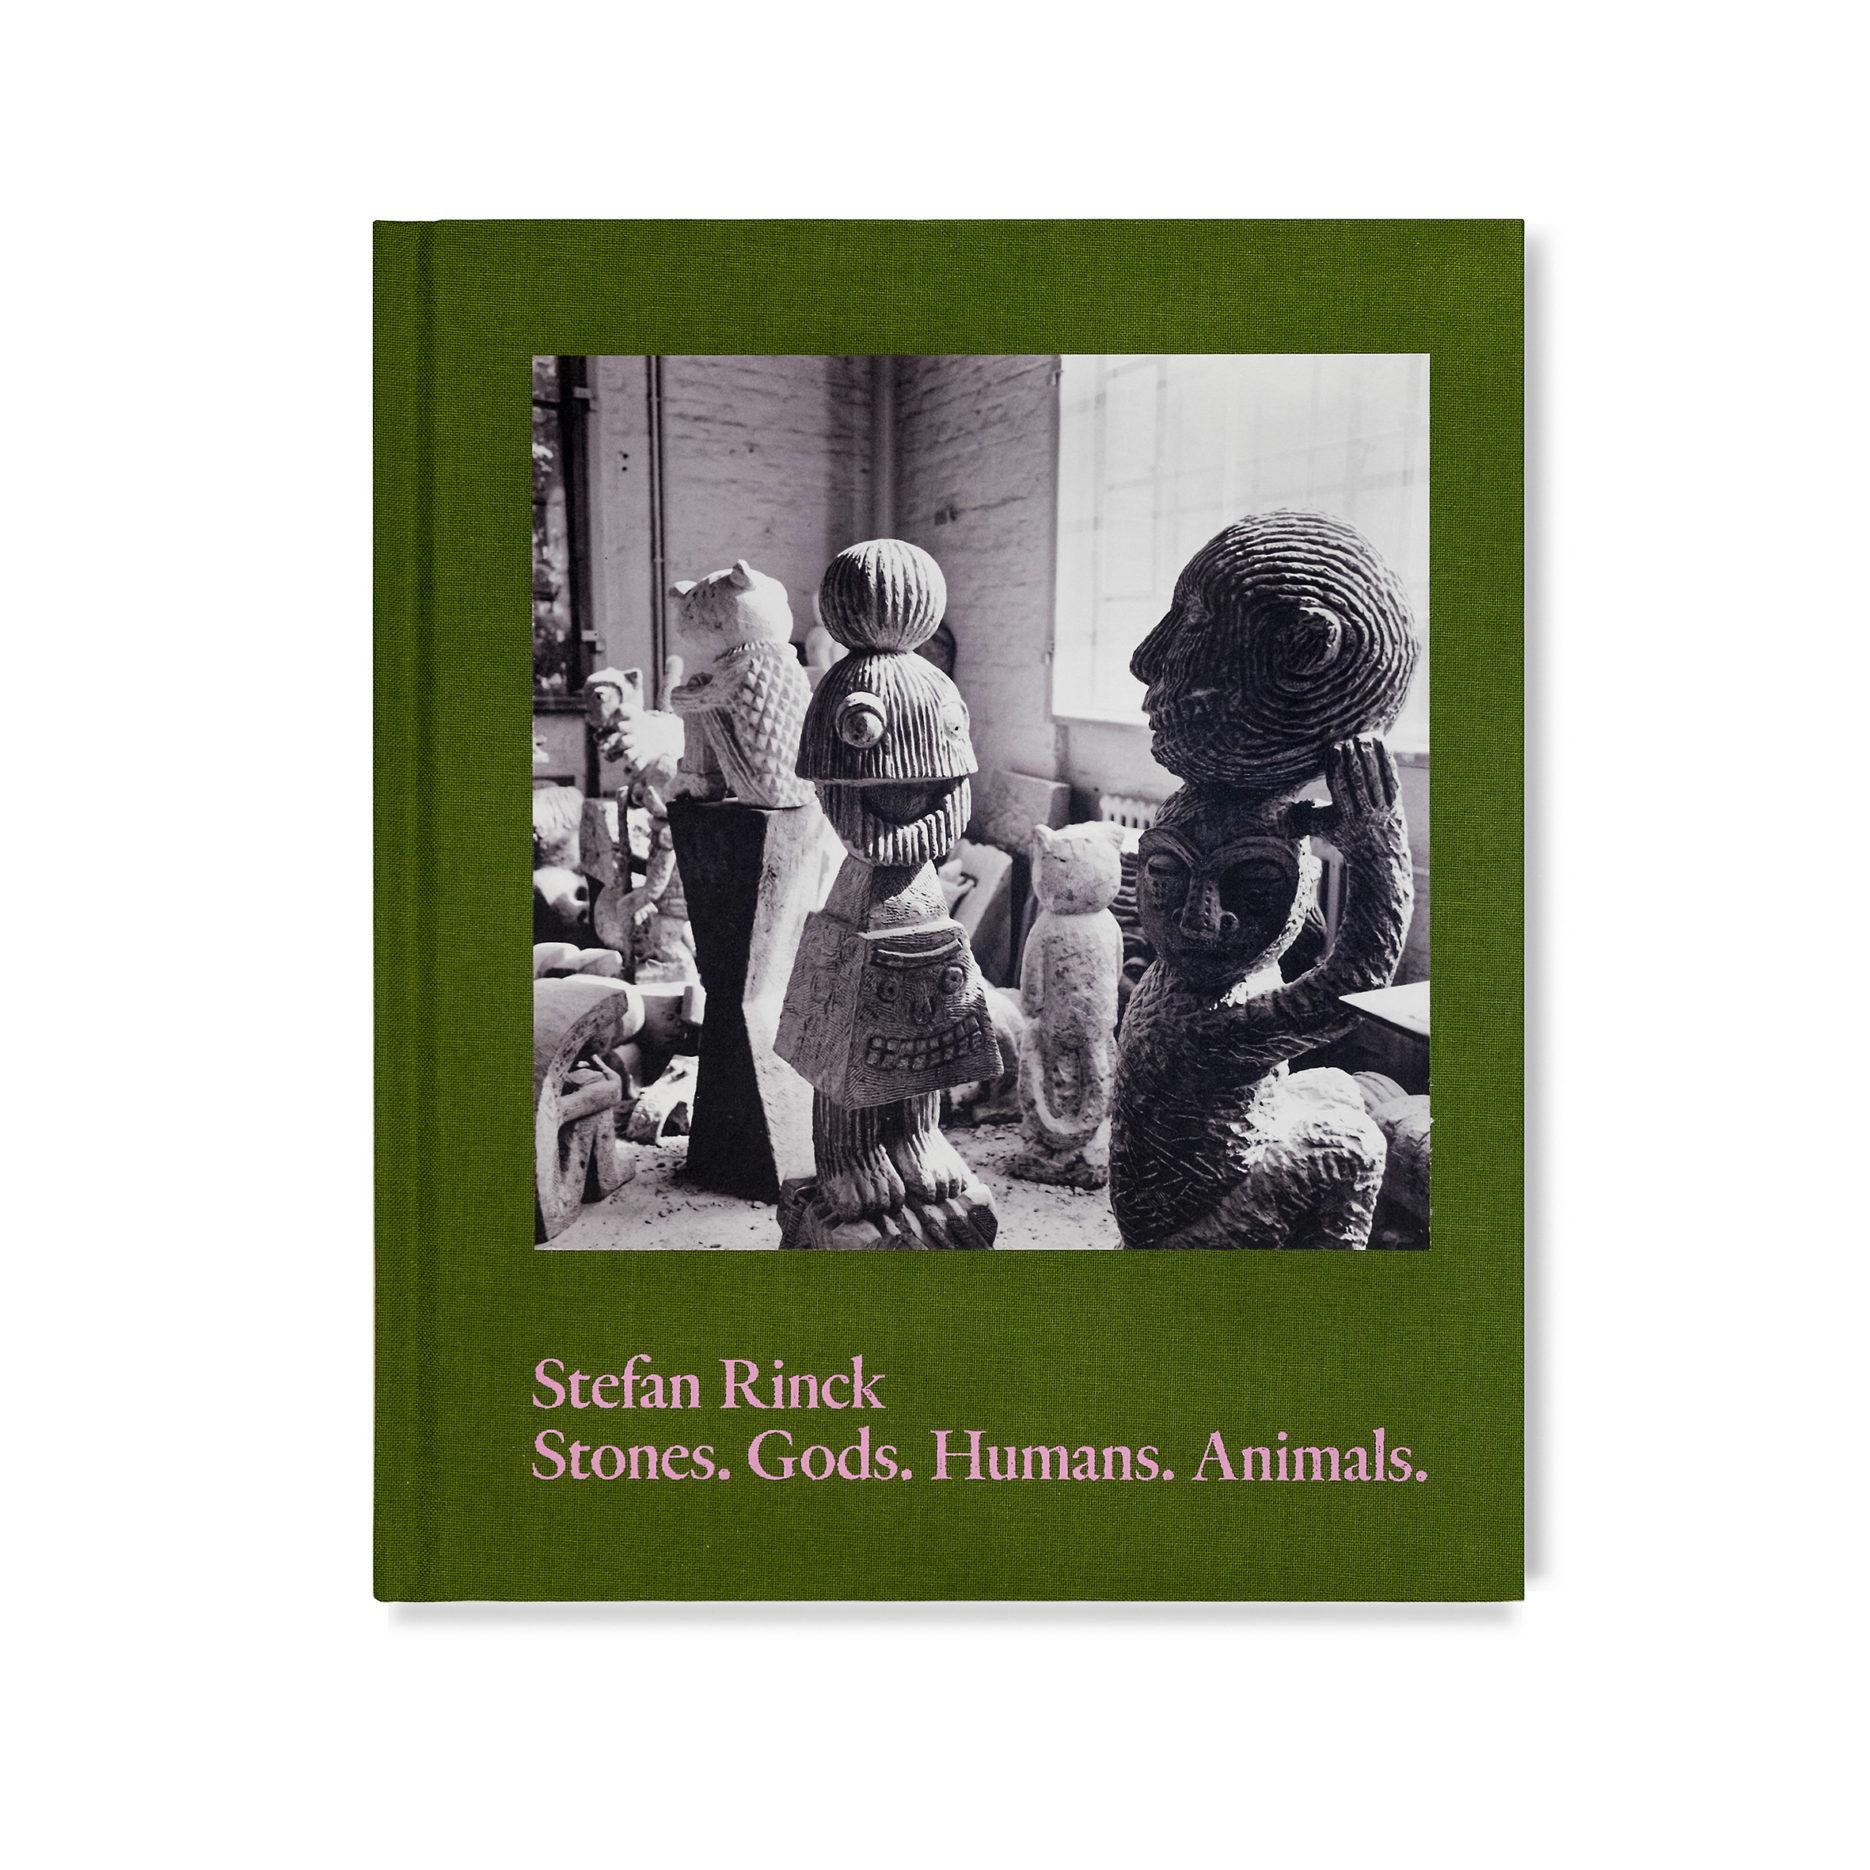 Stefan Rinck - Bibliography